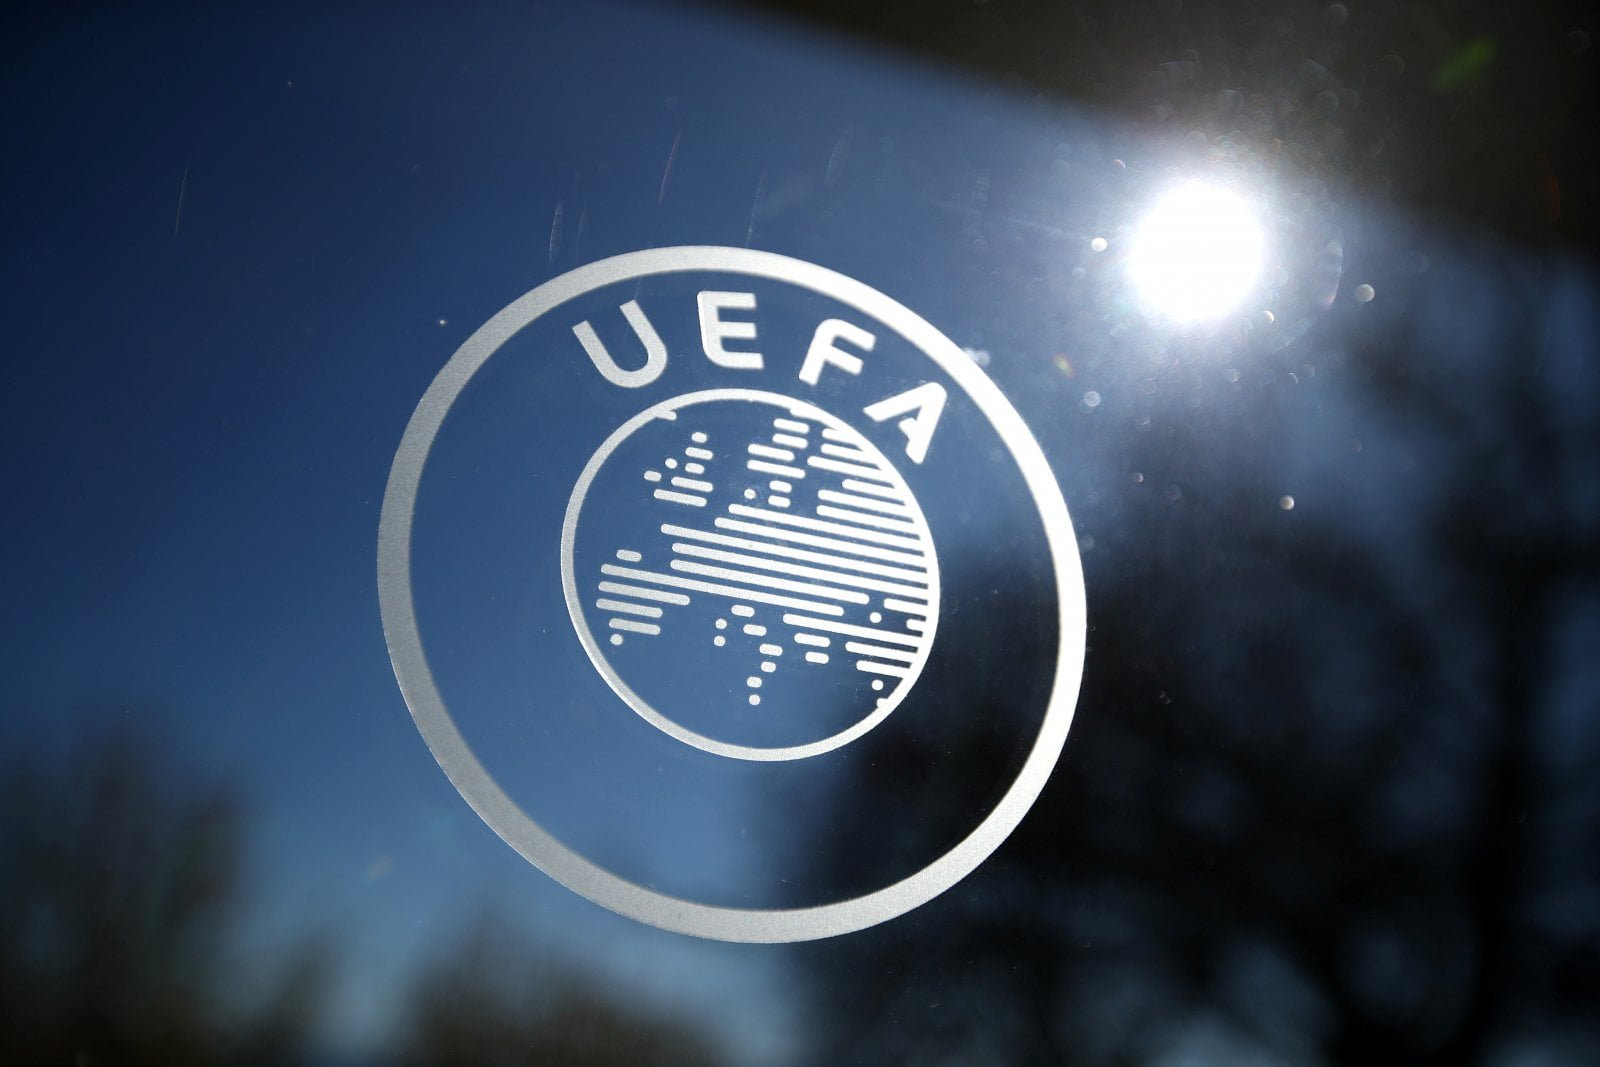 Chelsea vs Villarreal: UEFA confirms venue, date for Super Cup tie